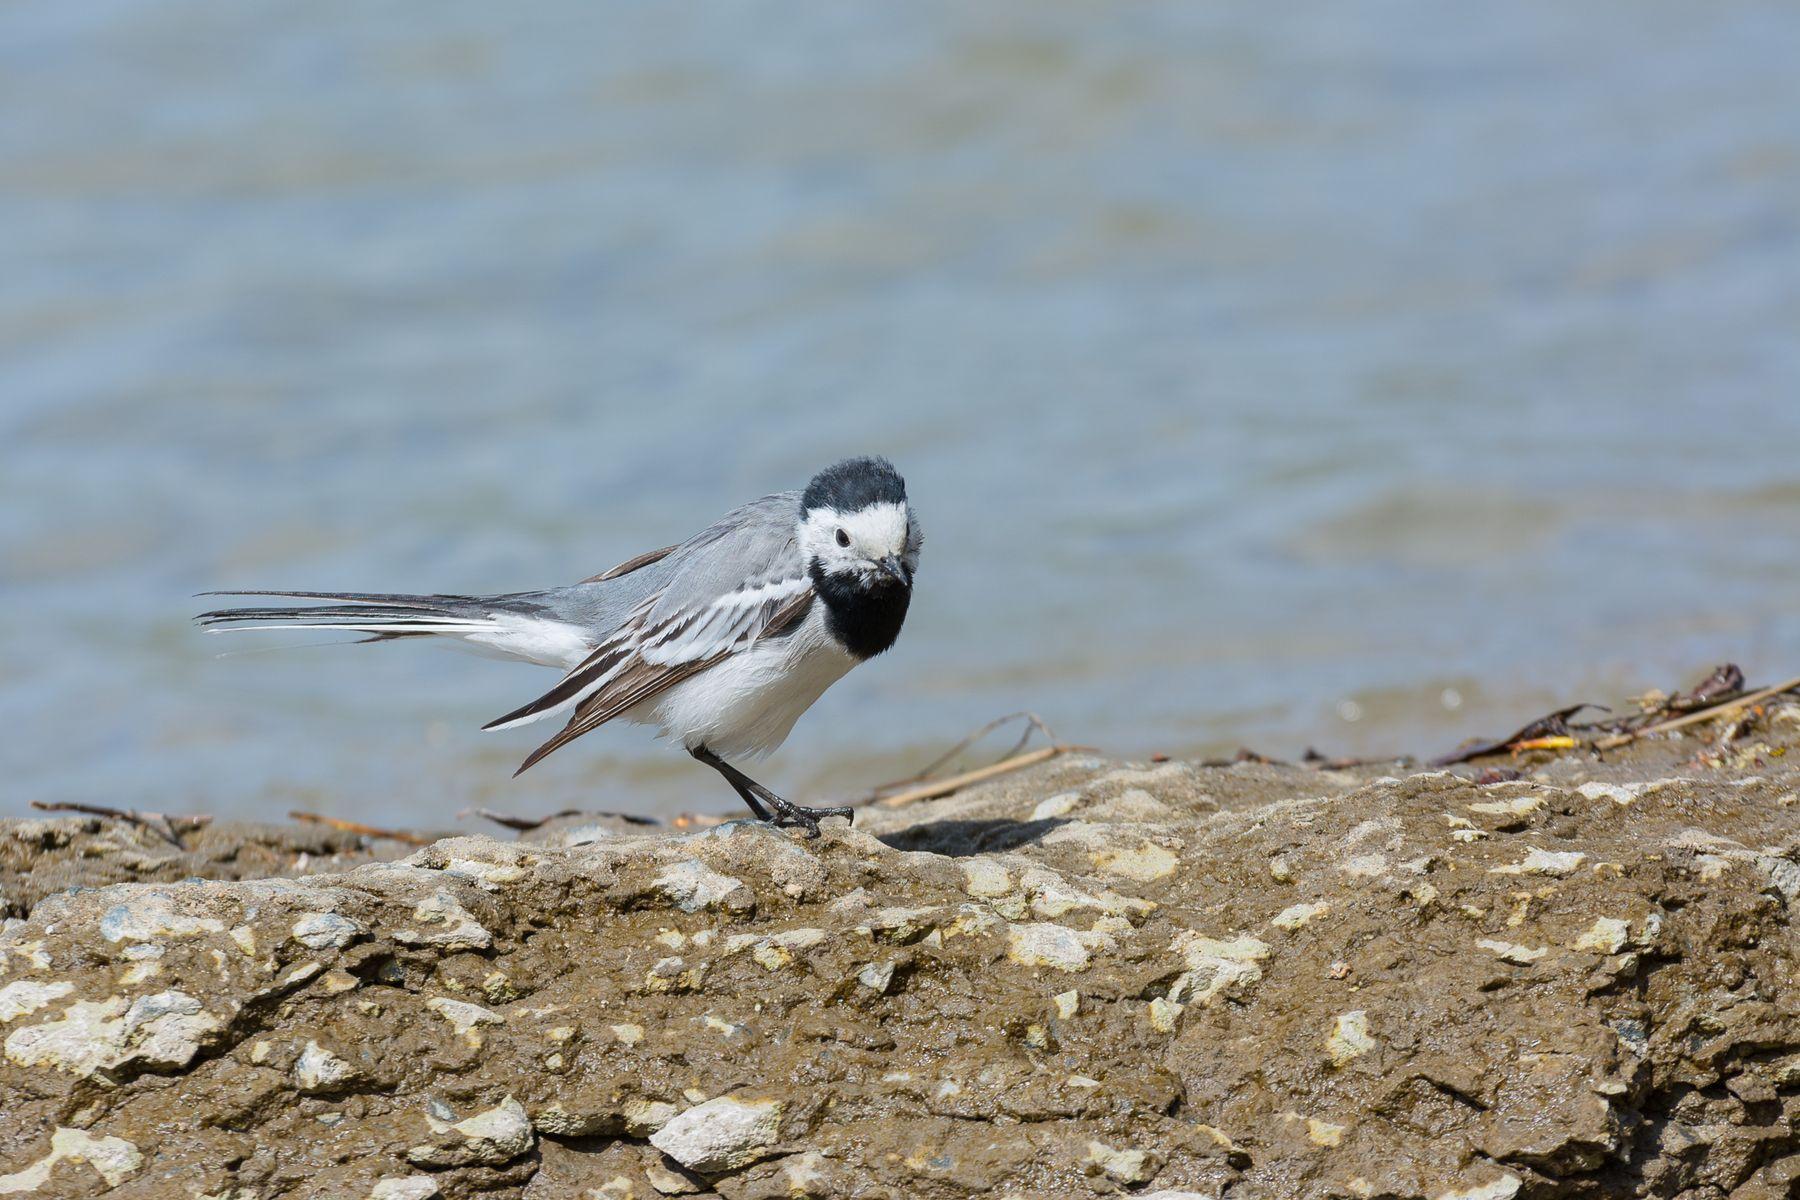 Трясогузка на побережье Трясогузка птица фотоохота Сибирь